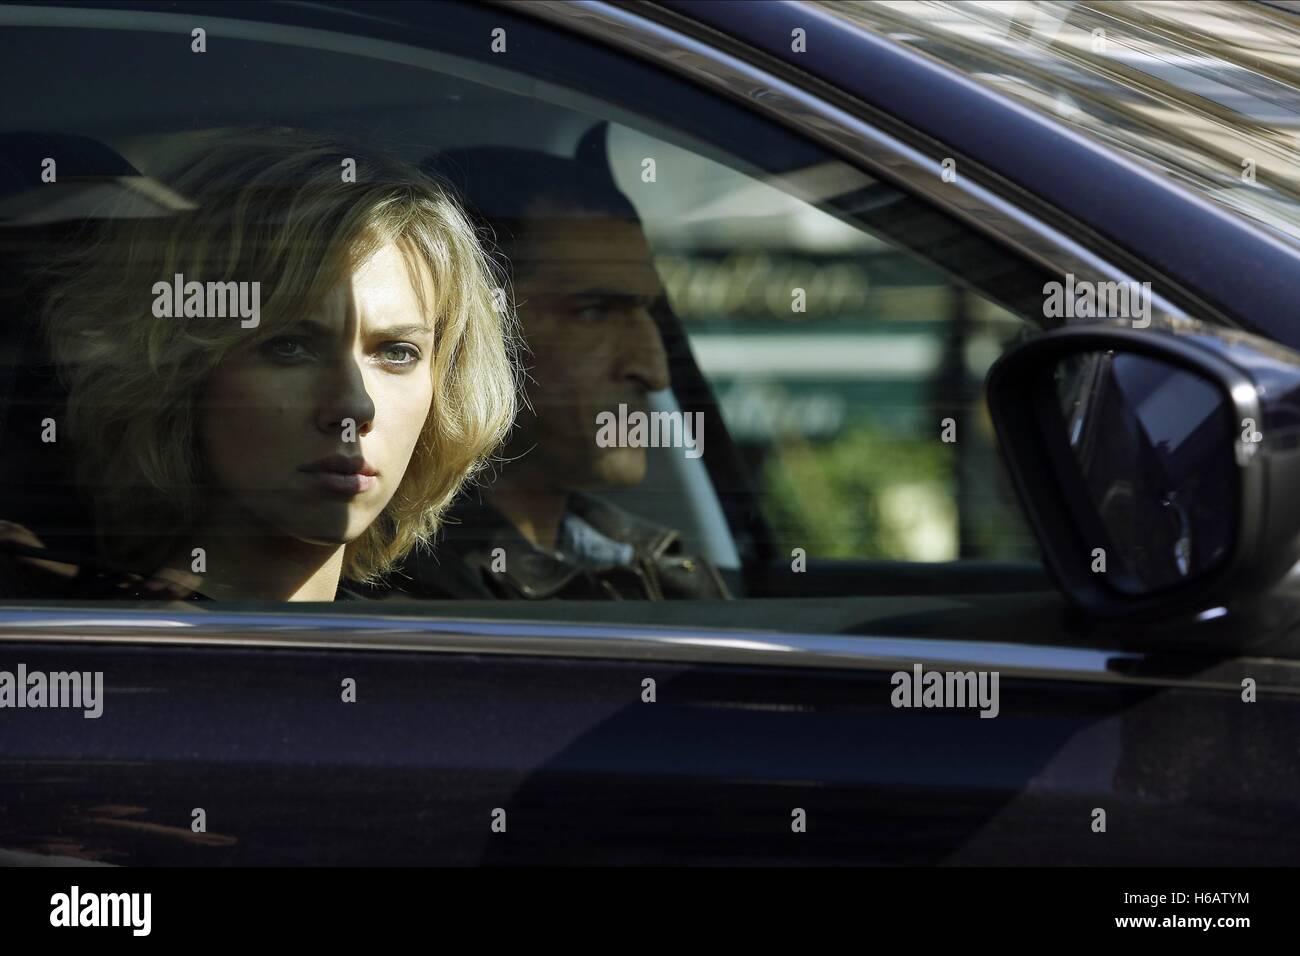 SCARLETT JOHANSSON LUCY (2014) - Stock Image